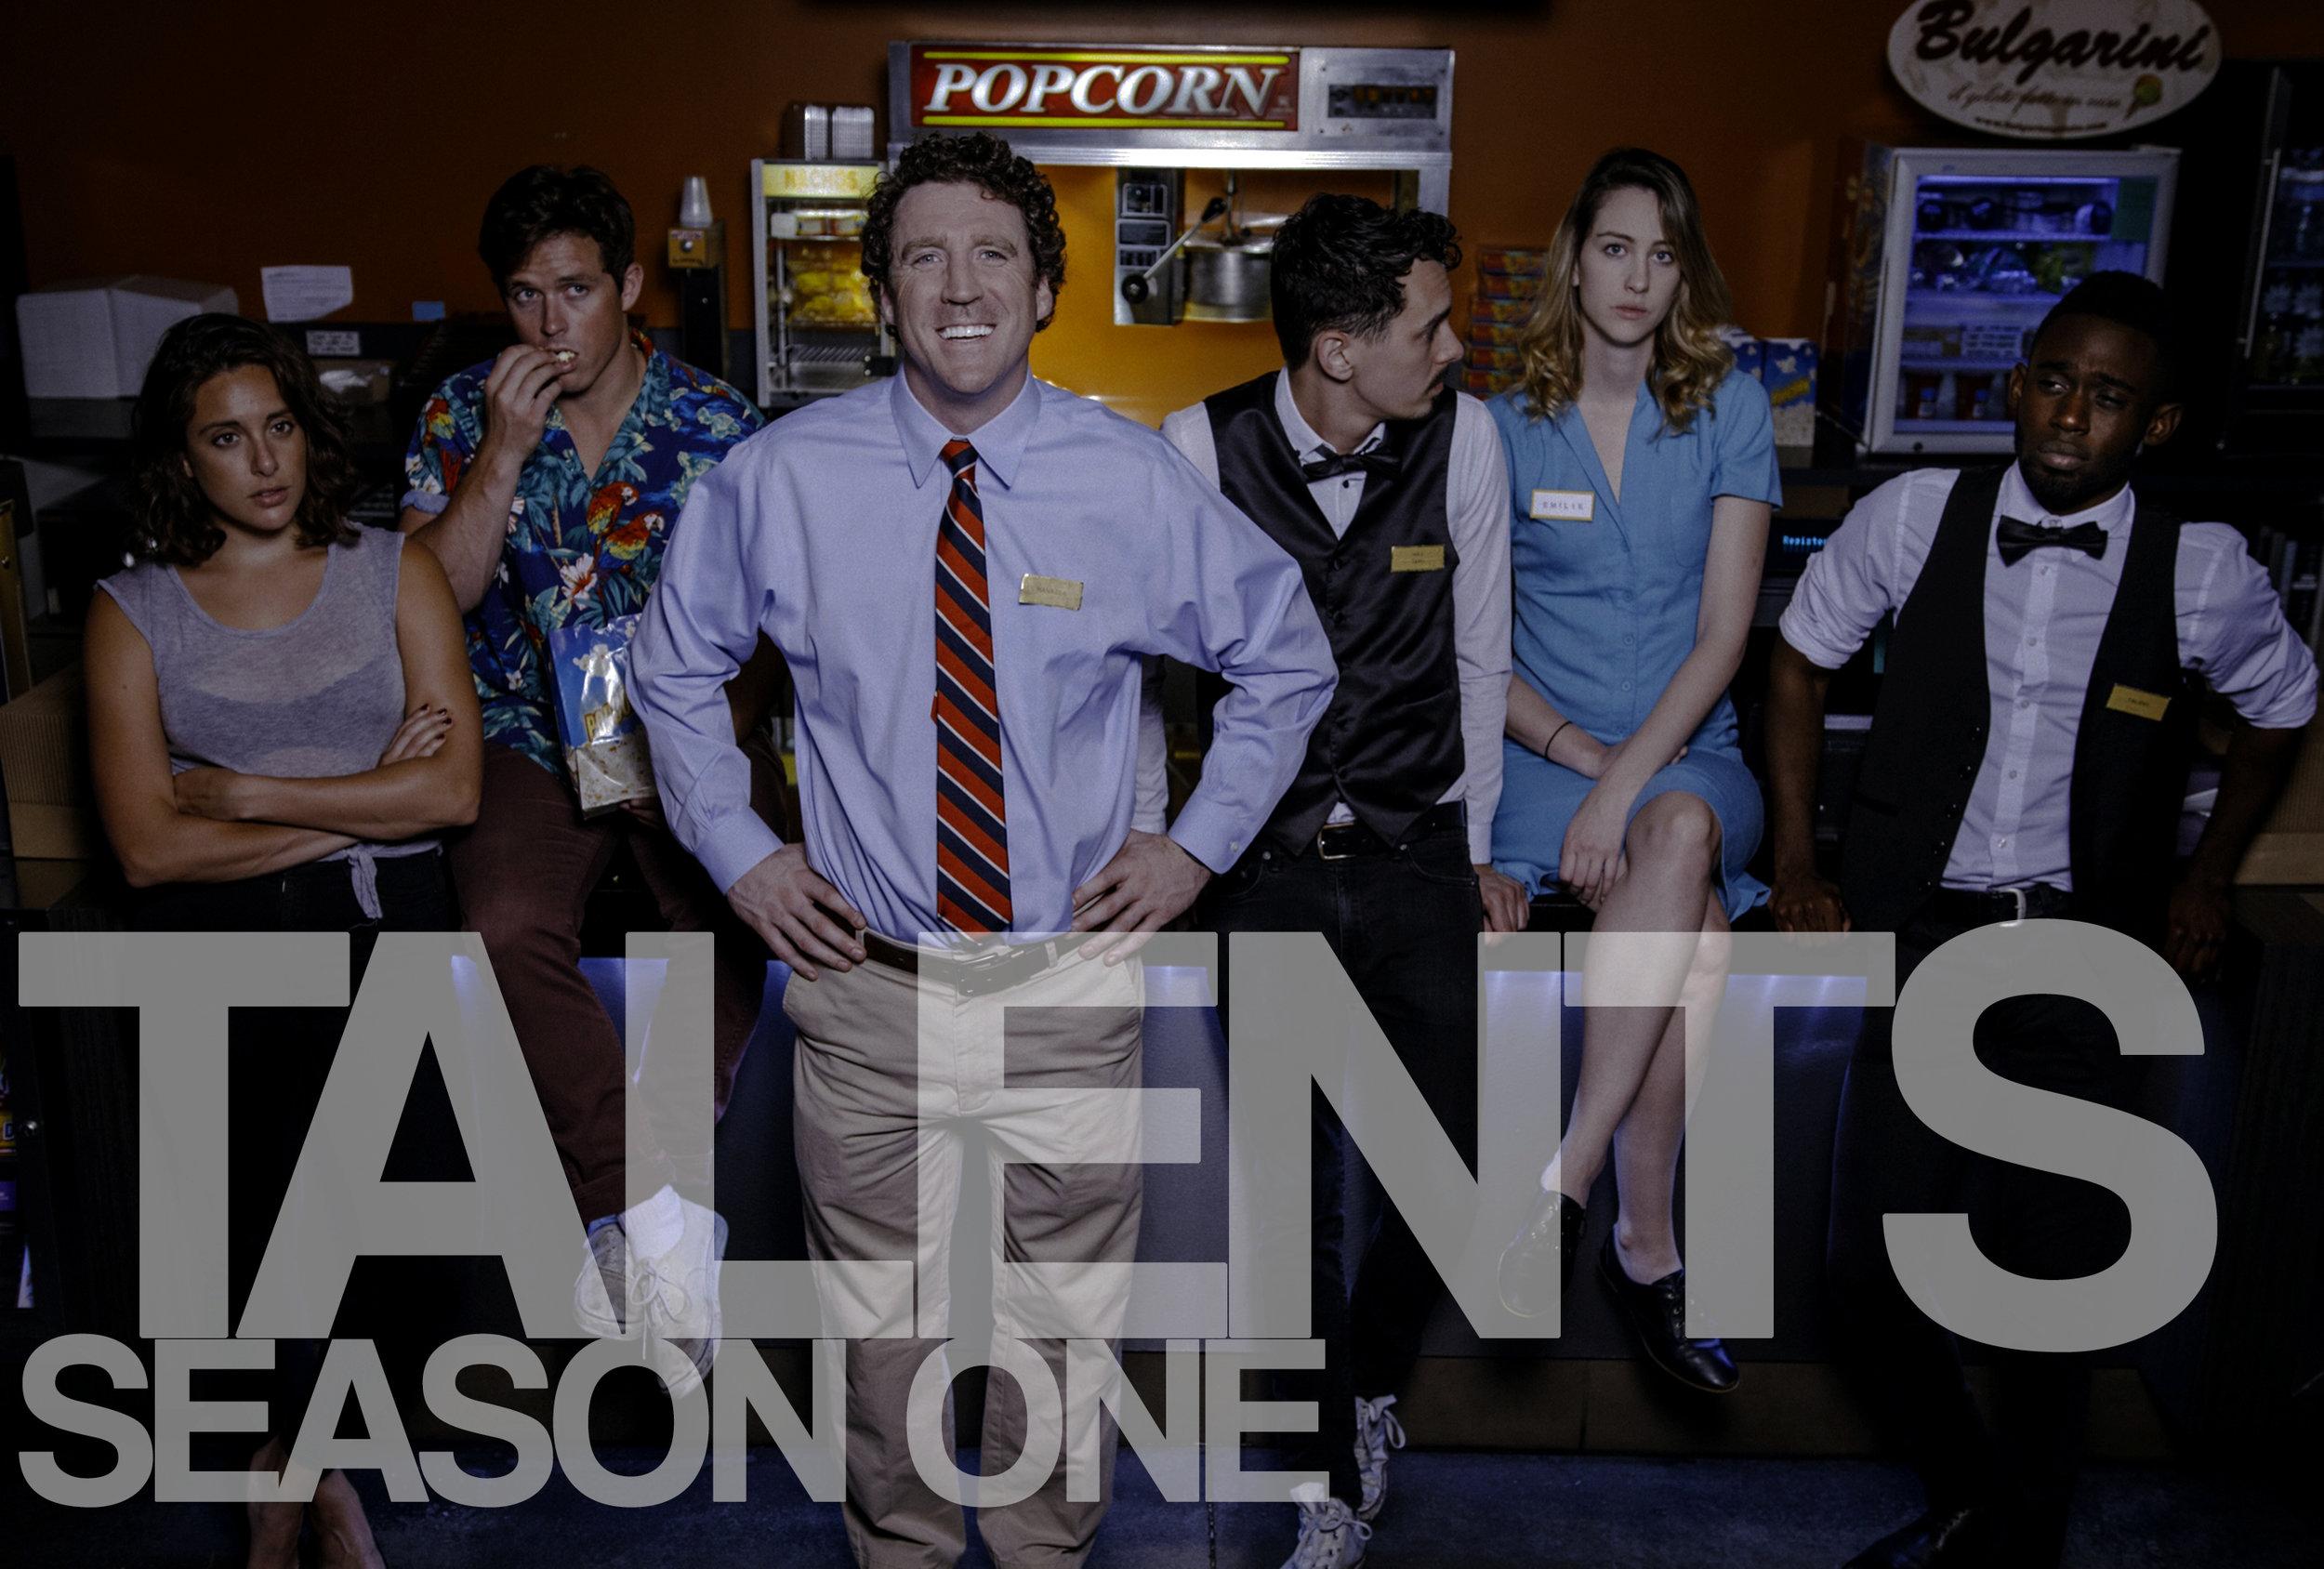 Talents Season 1 Cover.jpg